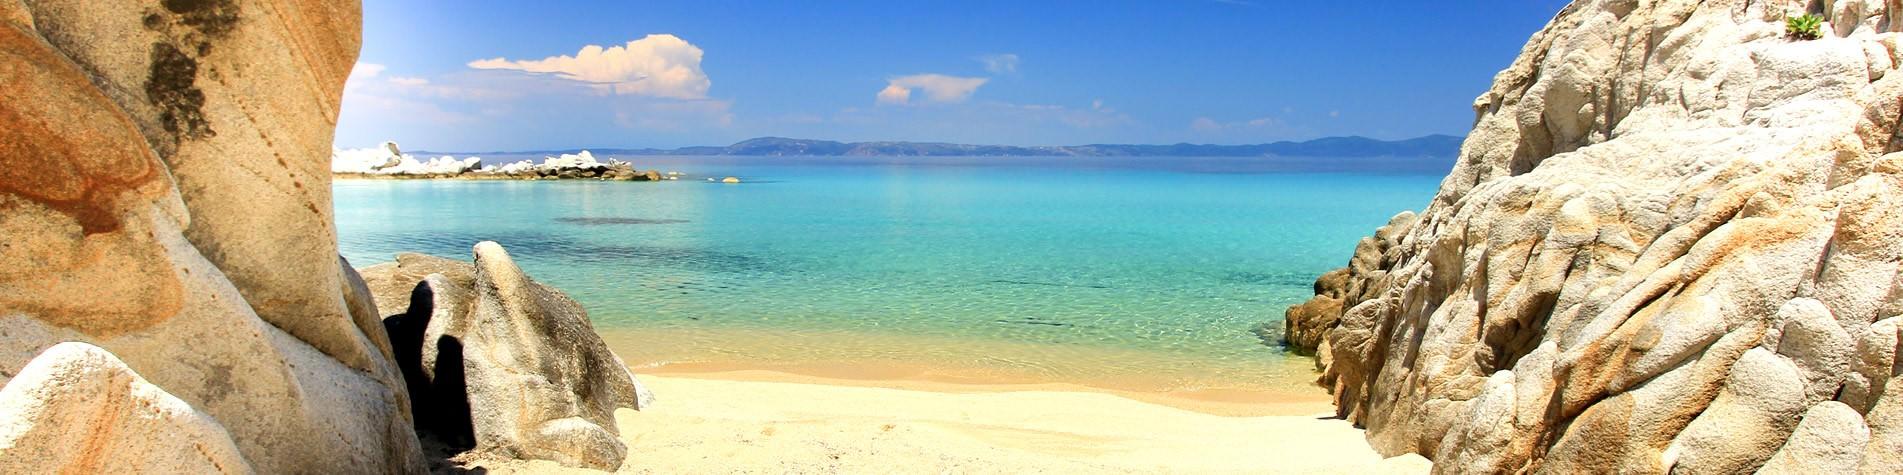 Halkidiki Holidays with Cyplon Holidays